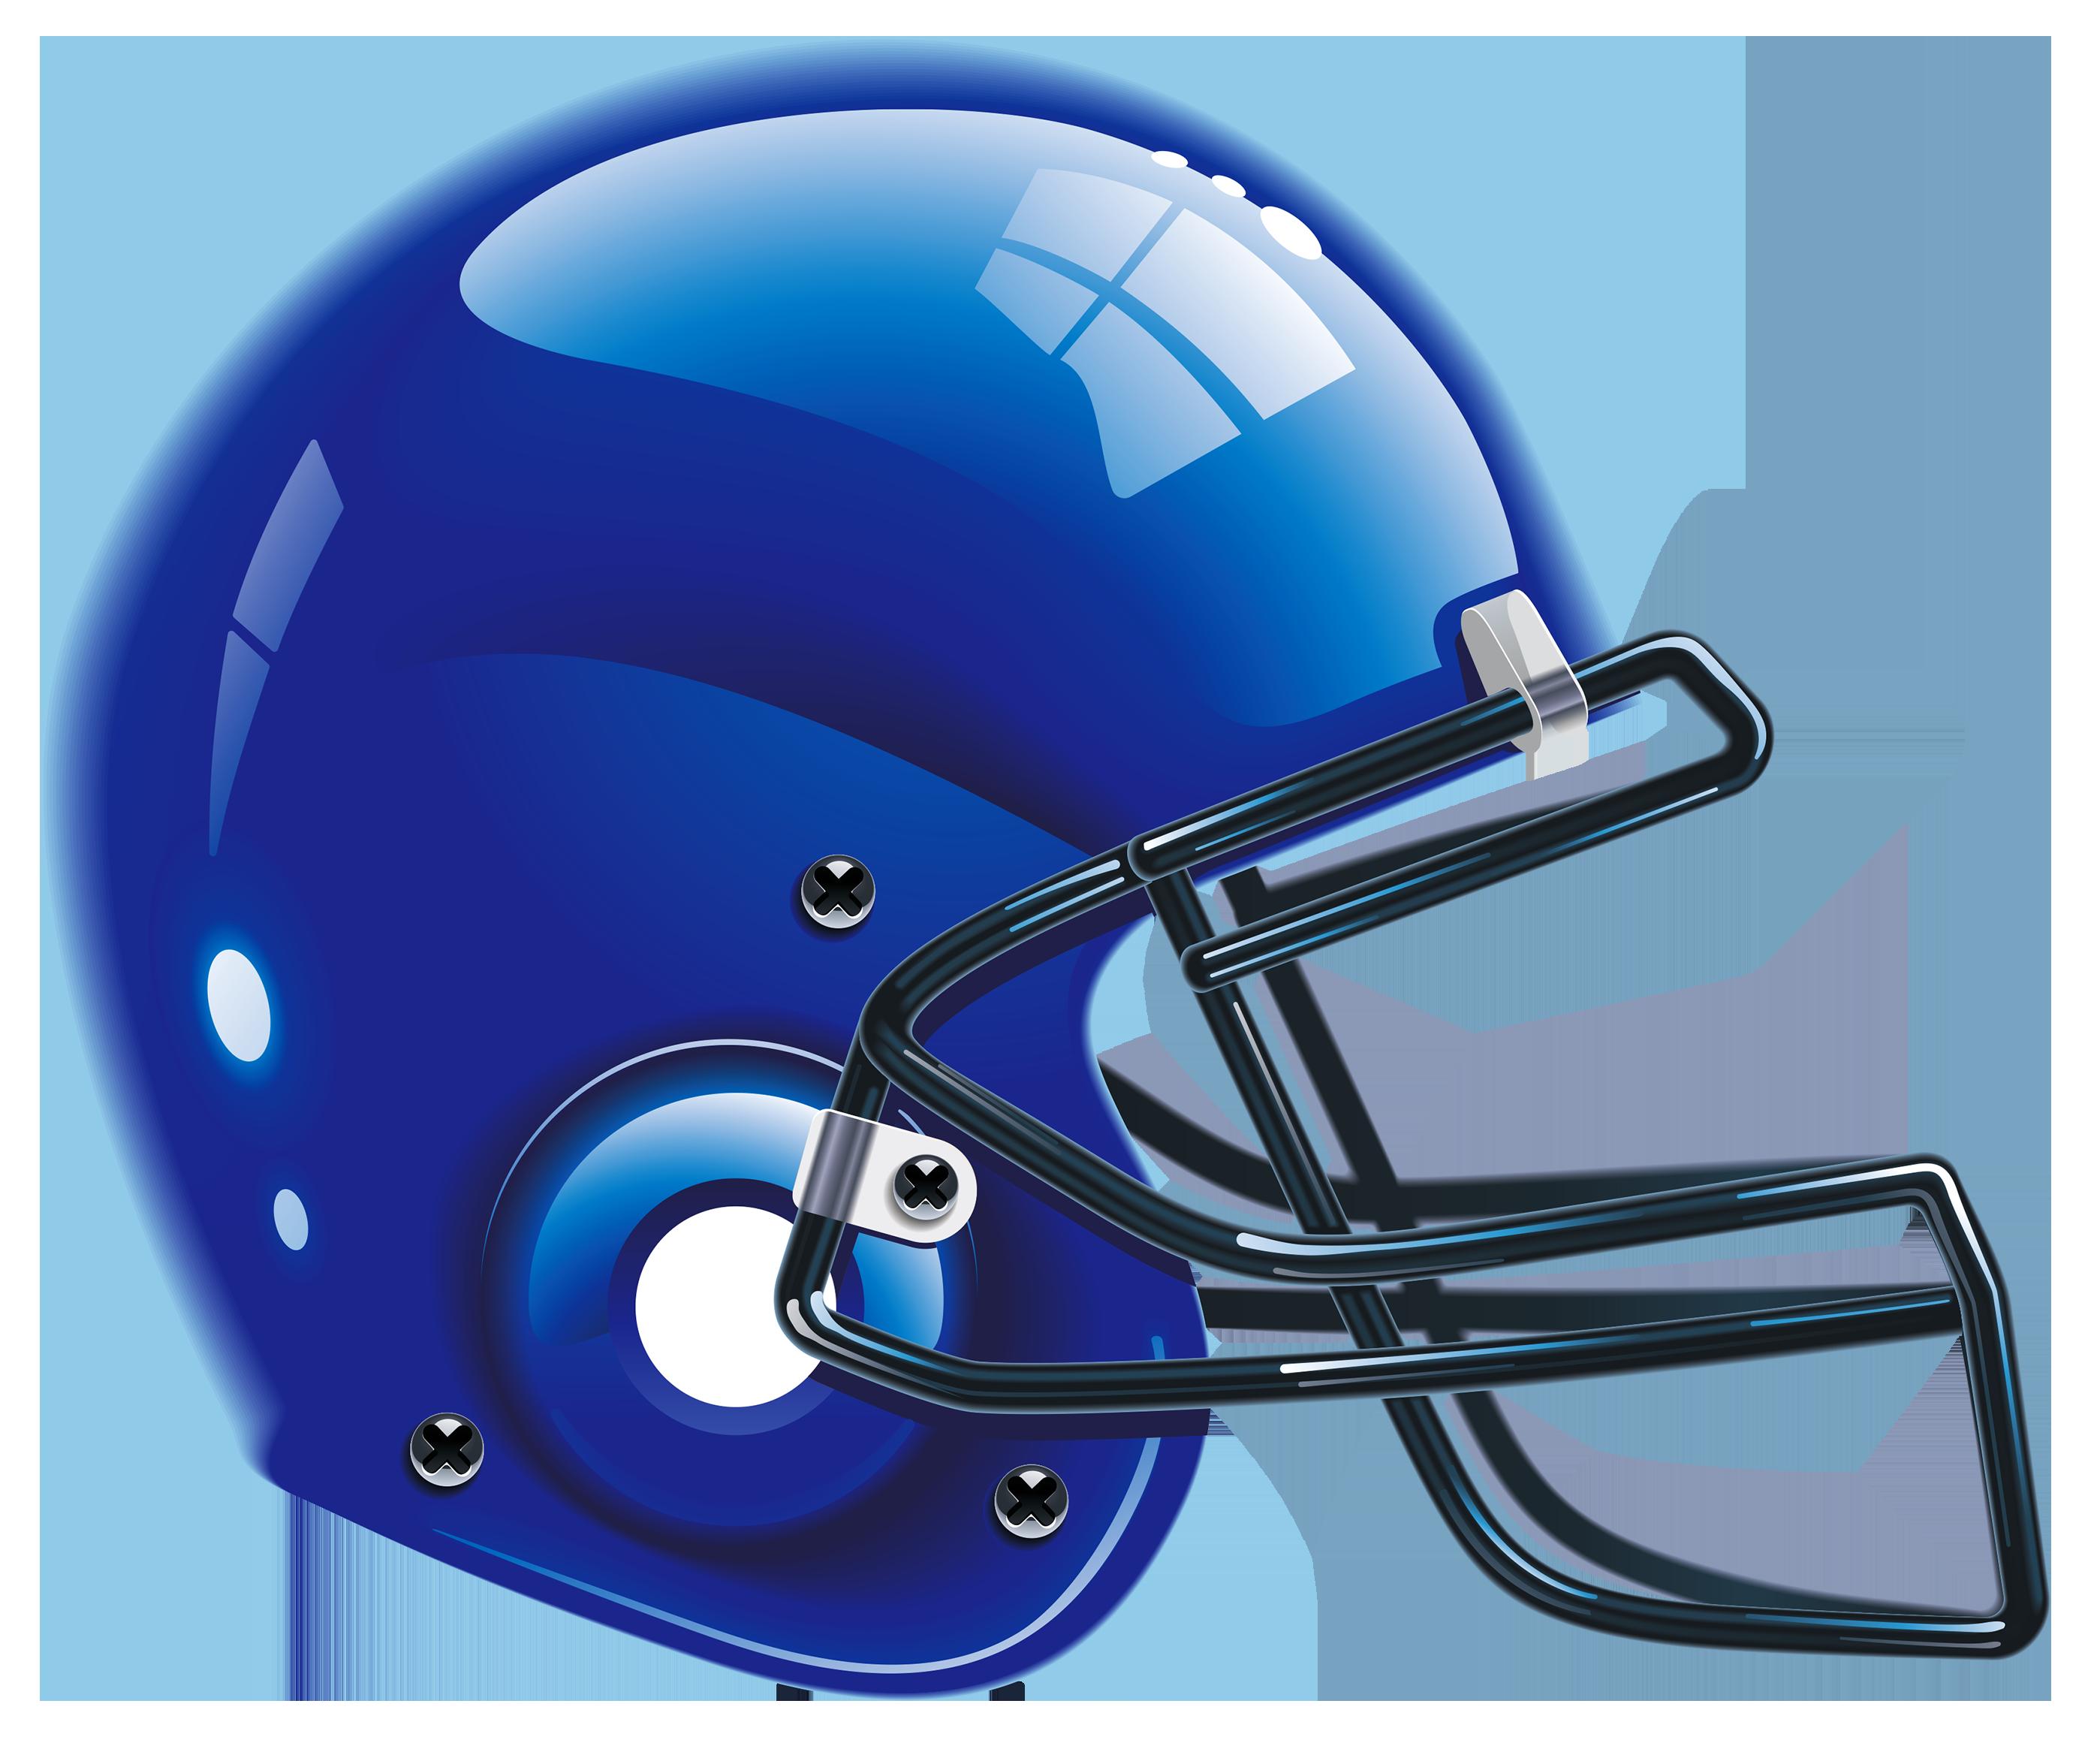 American football receiver art clipart black and white Dallas Cowboys NFL Arizona Cardinals Super Bowl Wide receiver - Blue ... black and white